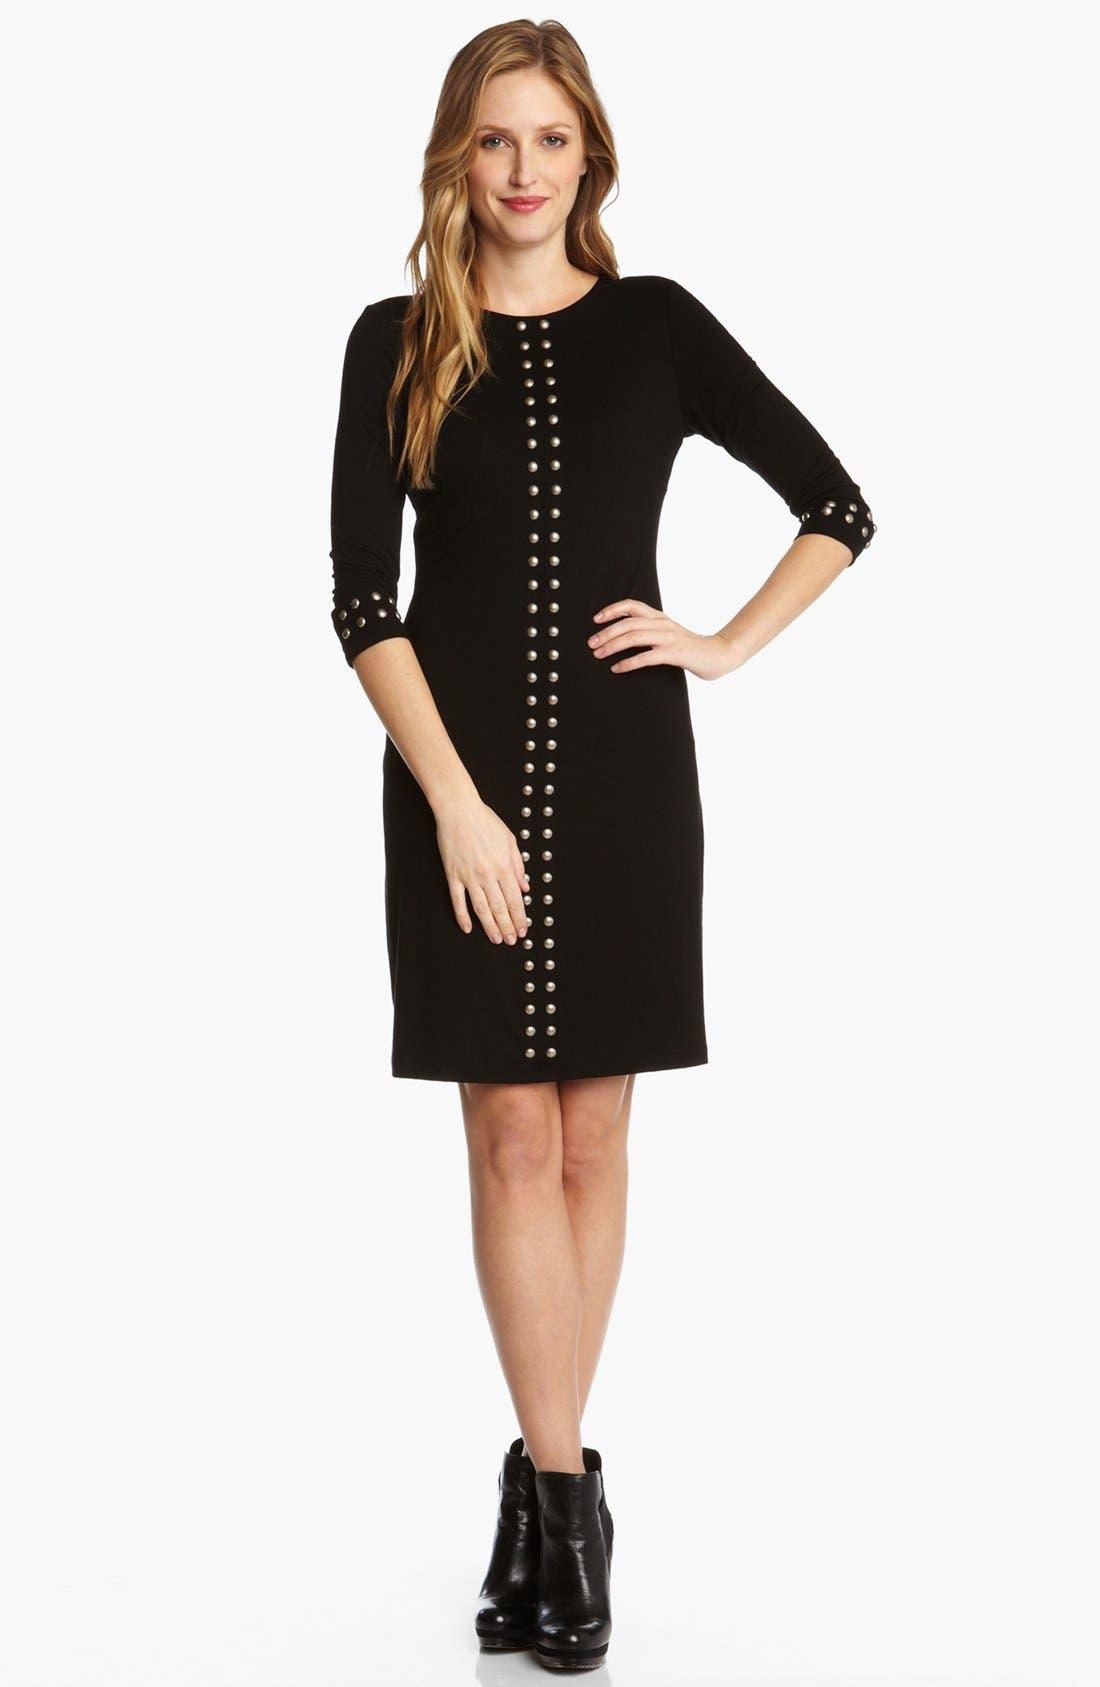 Main Image - Karen Kane 'Left Bank' Studded Jersey Dress